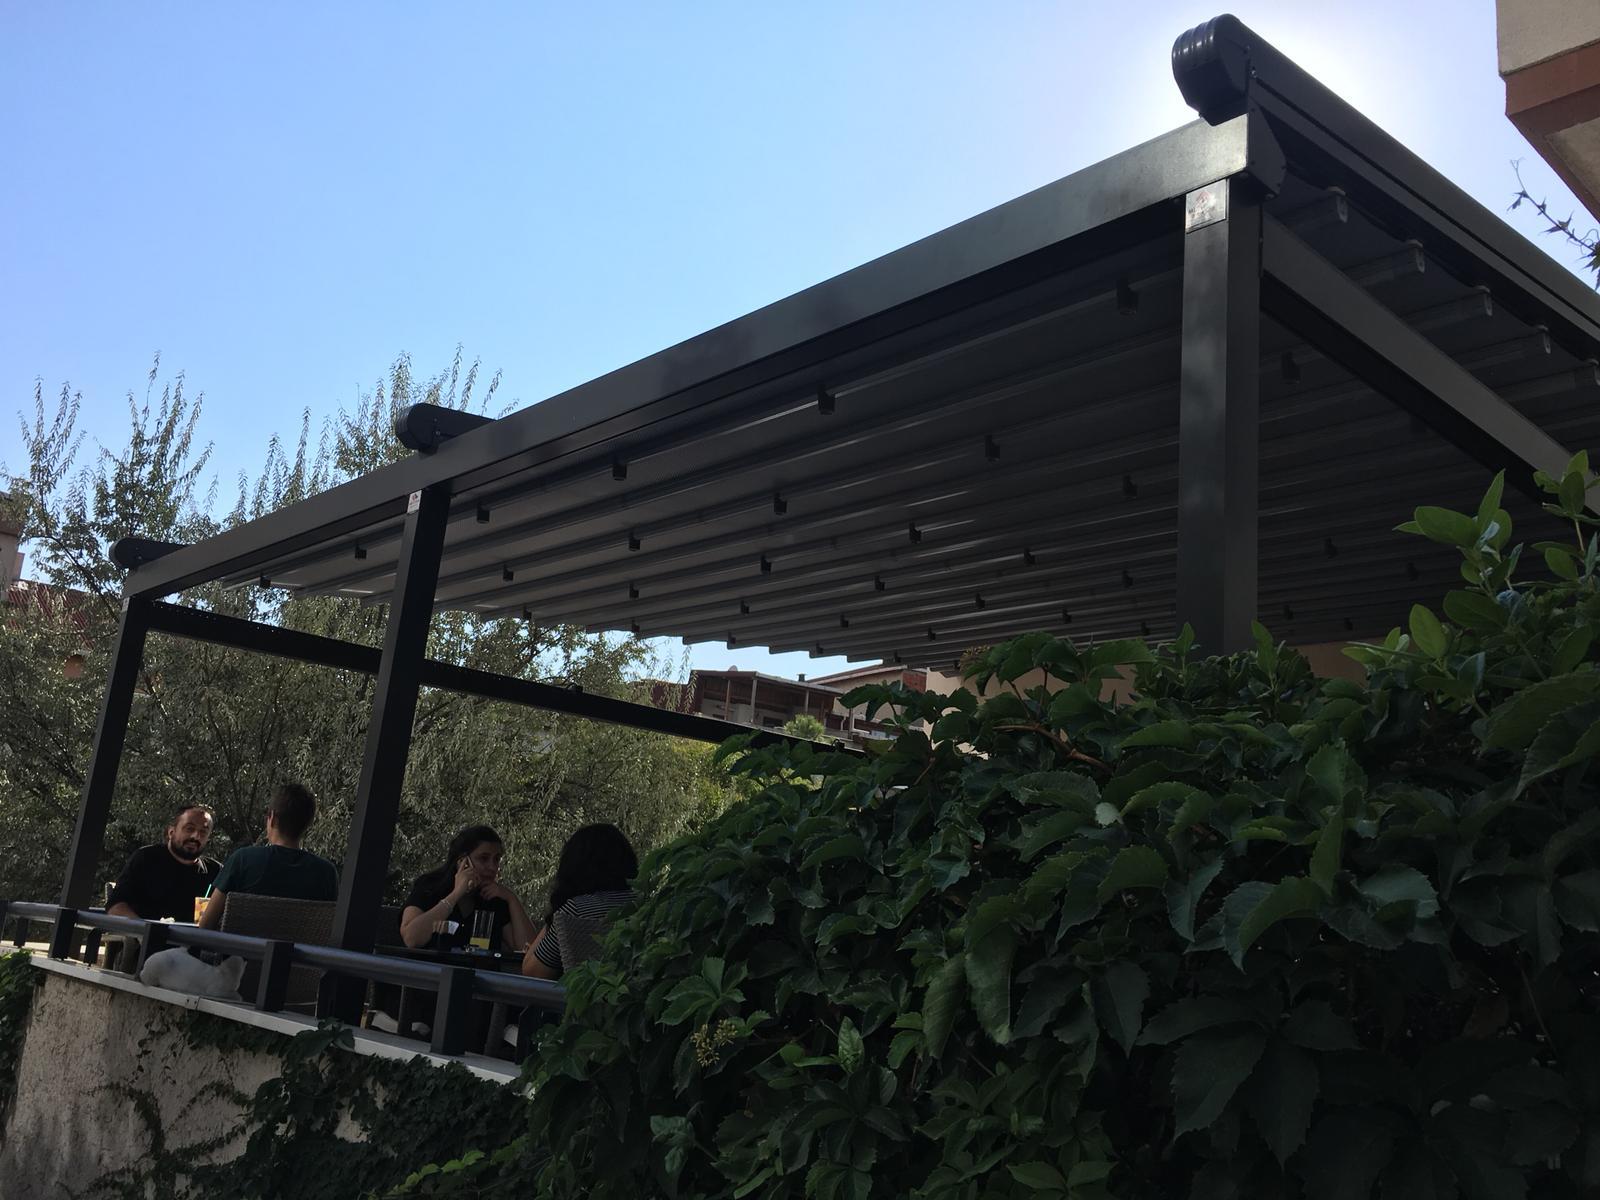 divan-cafe-merkez-uskudar